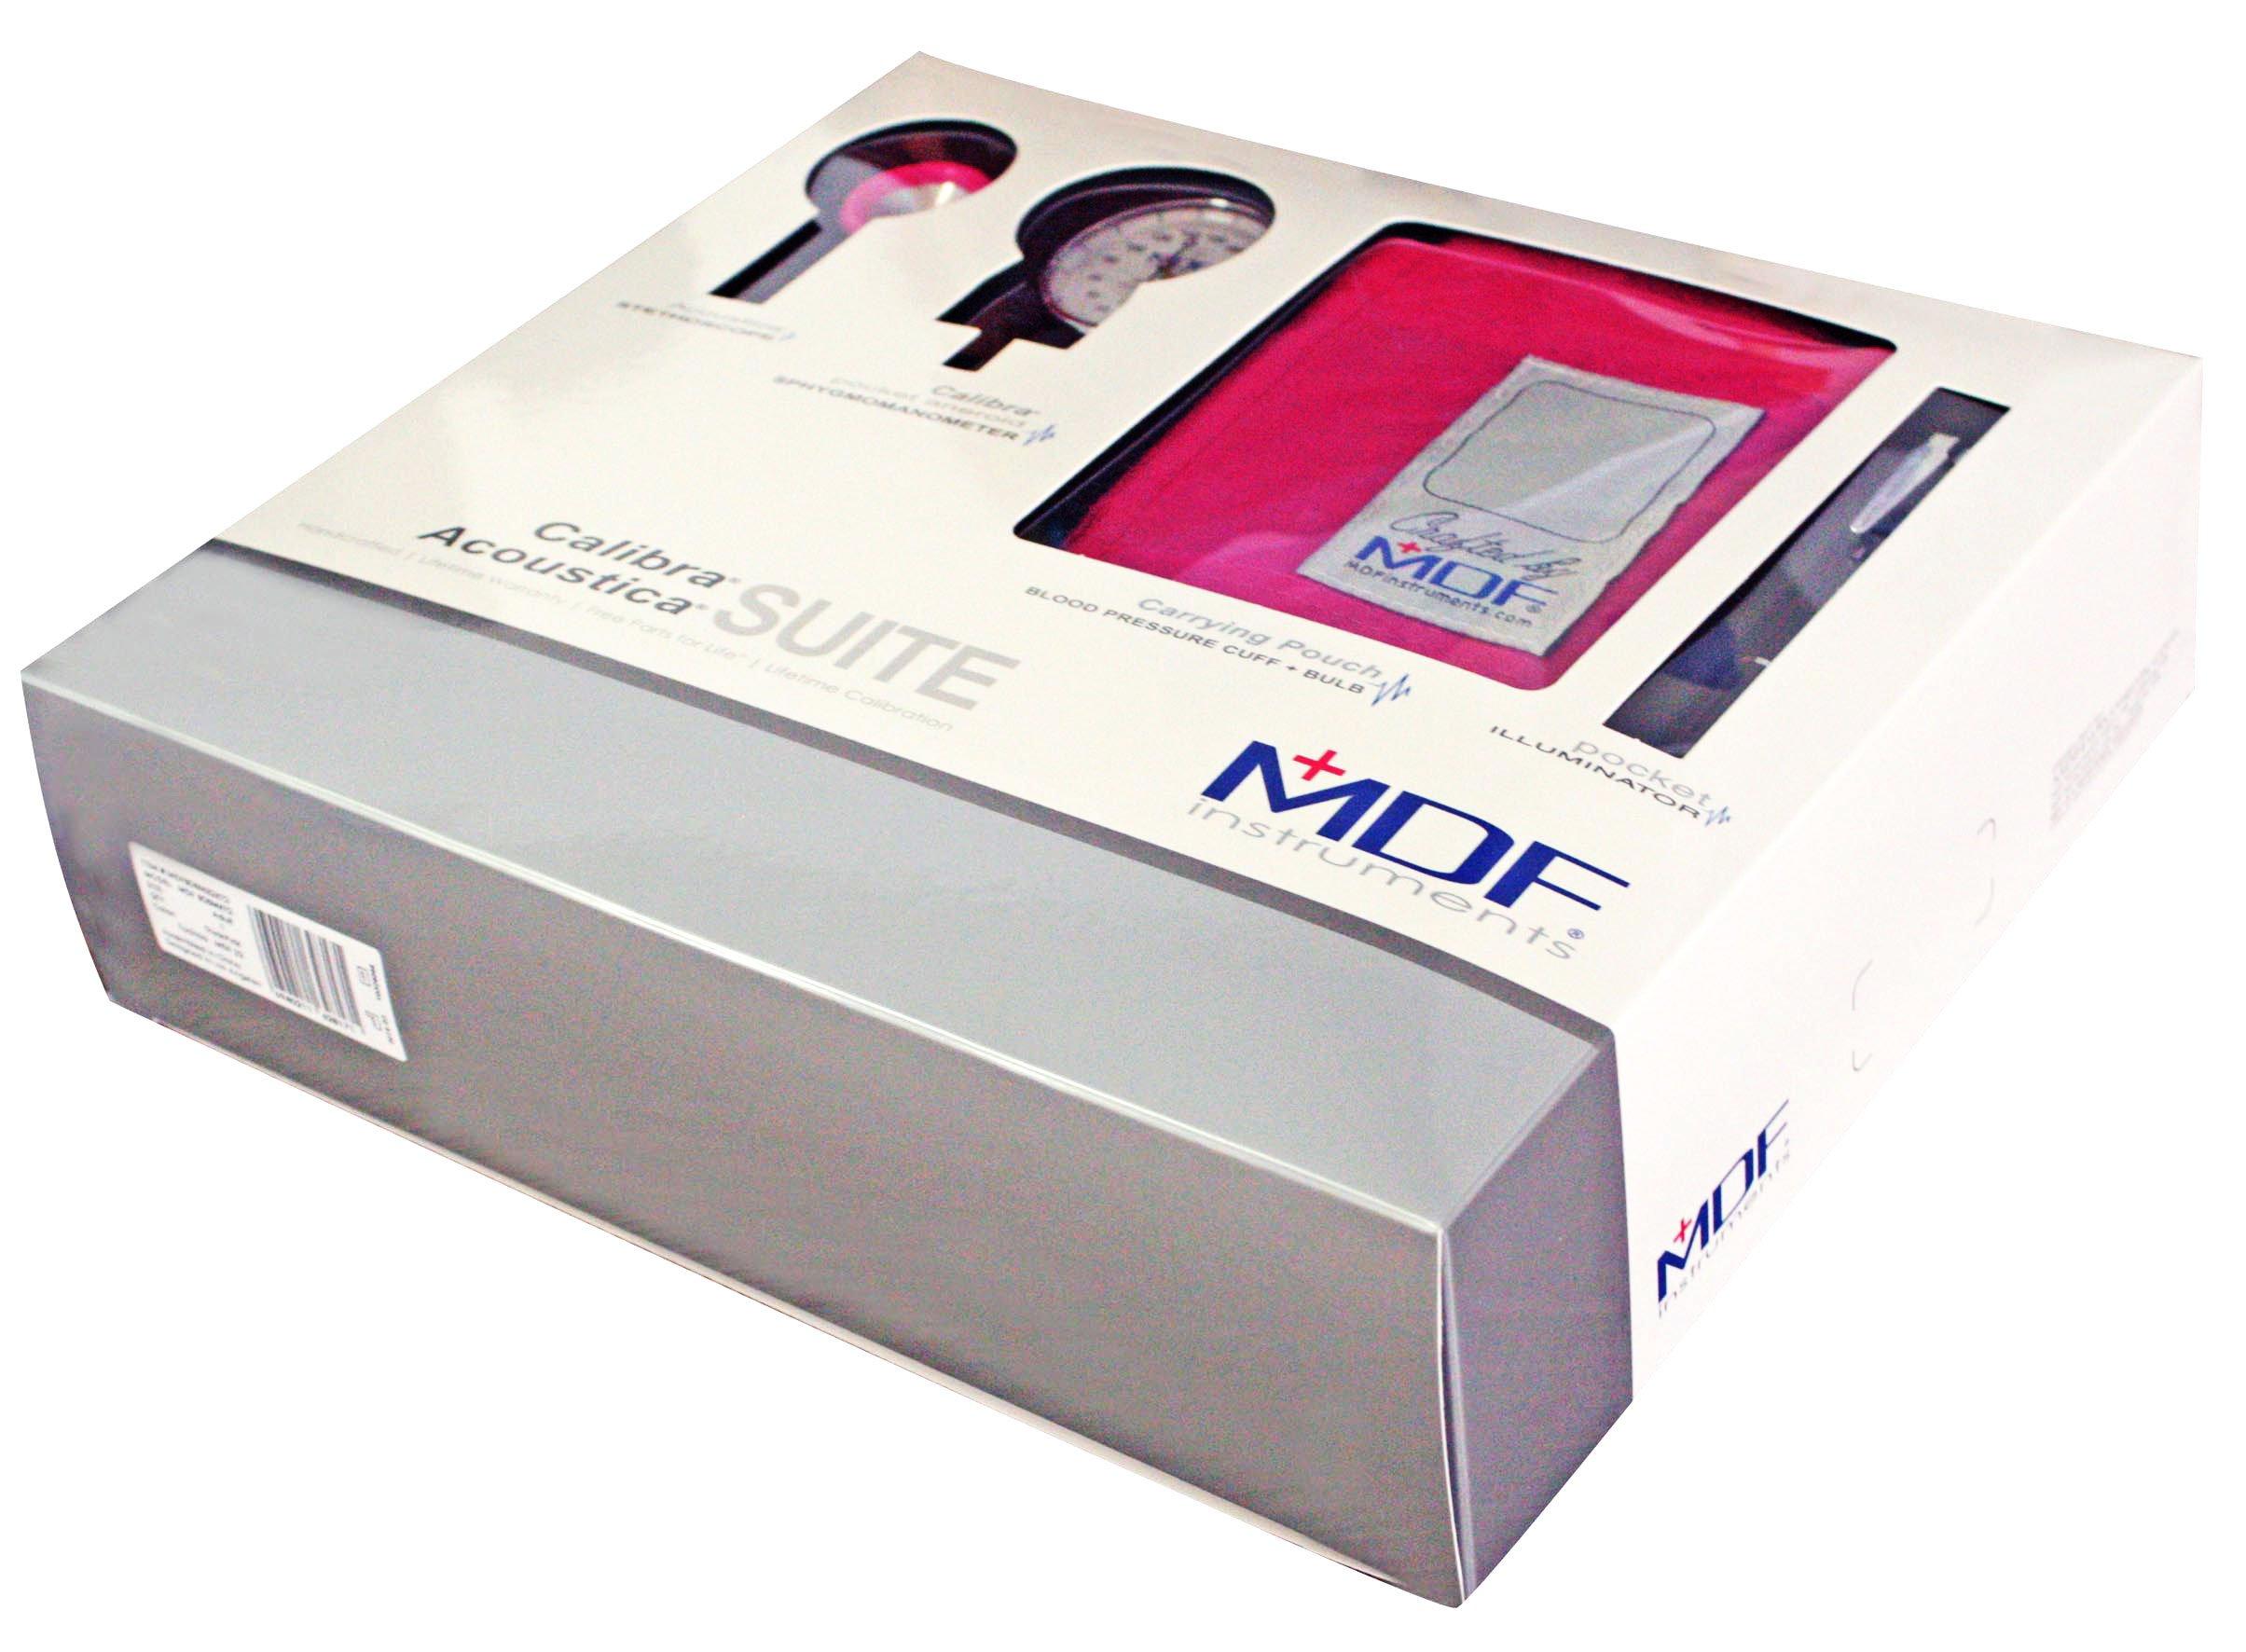 MDF Acoustica Deluxe Lightweight Dual Head Stethoscope, MDF Calibra Aneroid Sphygmomanometer, MDF POCKET iLLUMiNATOR Medical Professional Diagnostic Penlight - Fuchia (ThinkPink)